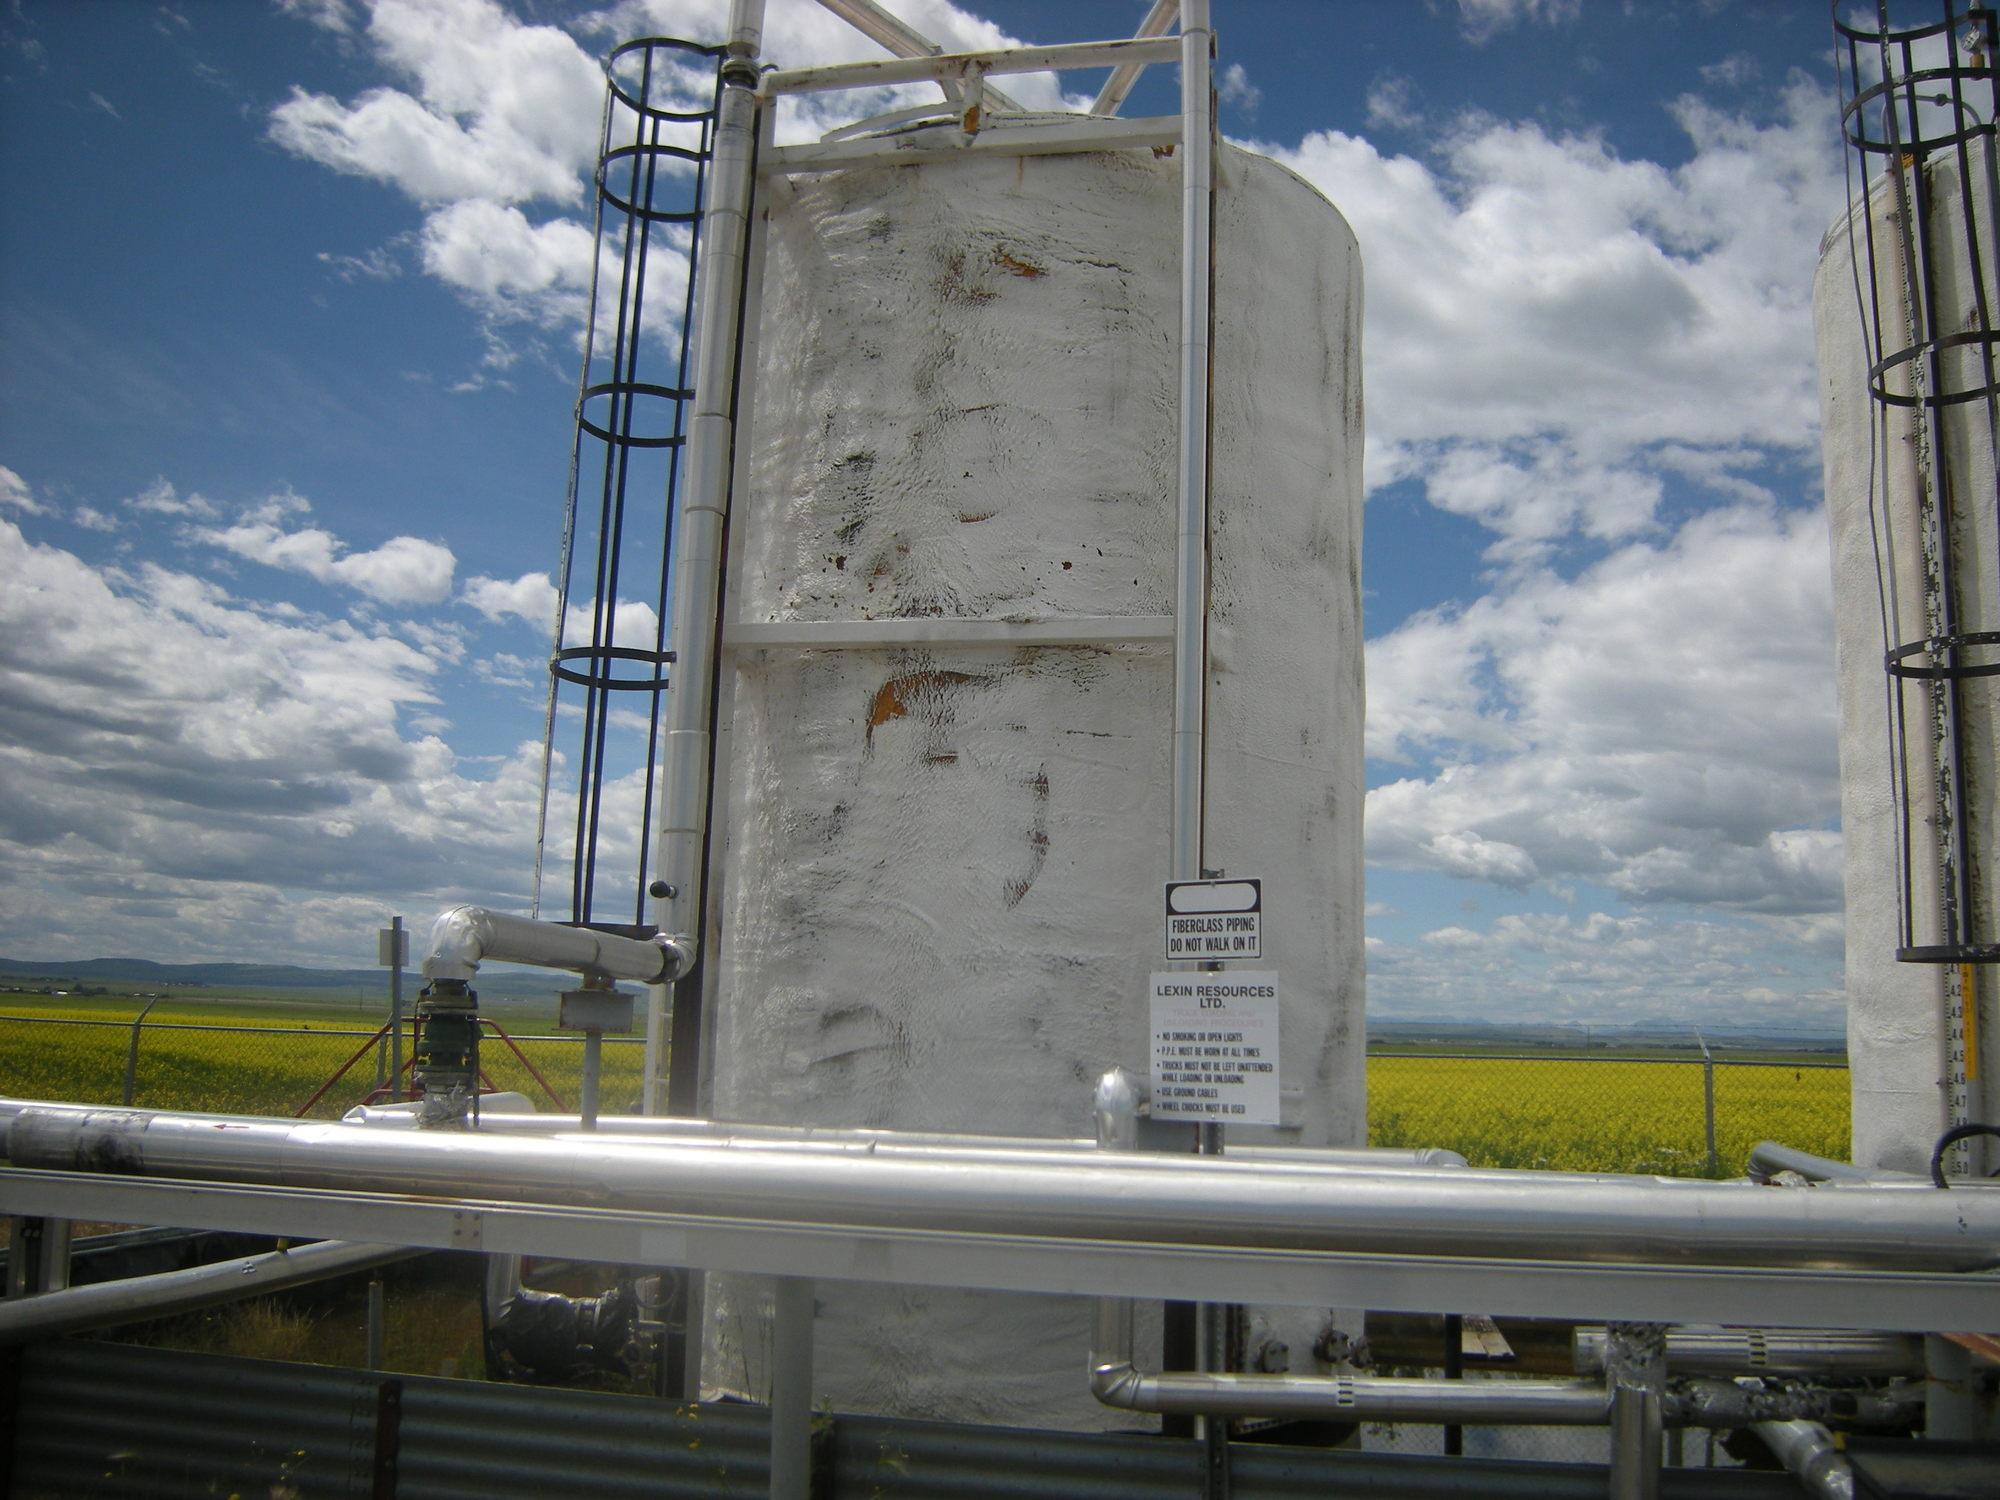 1998 storagetank - 400 bbl